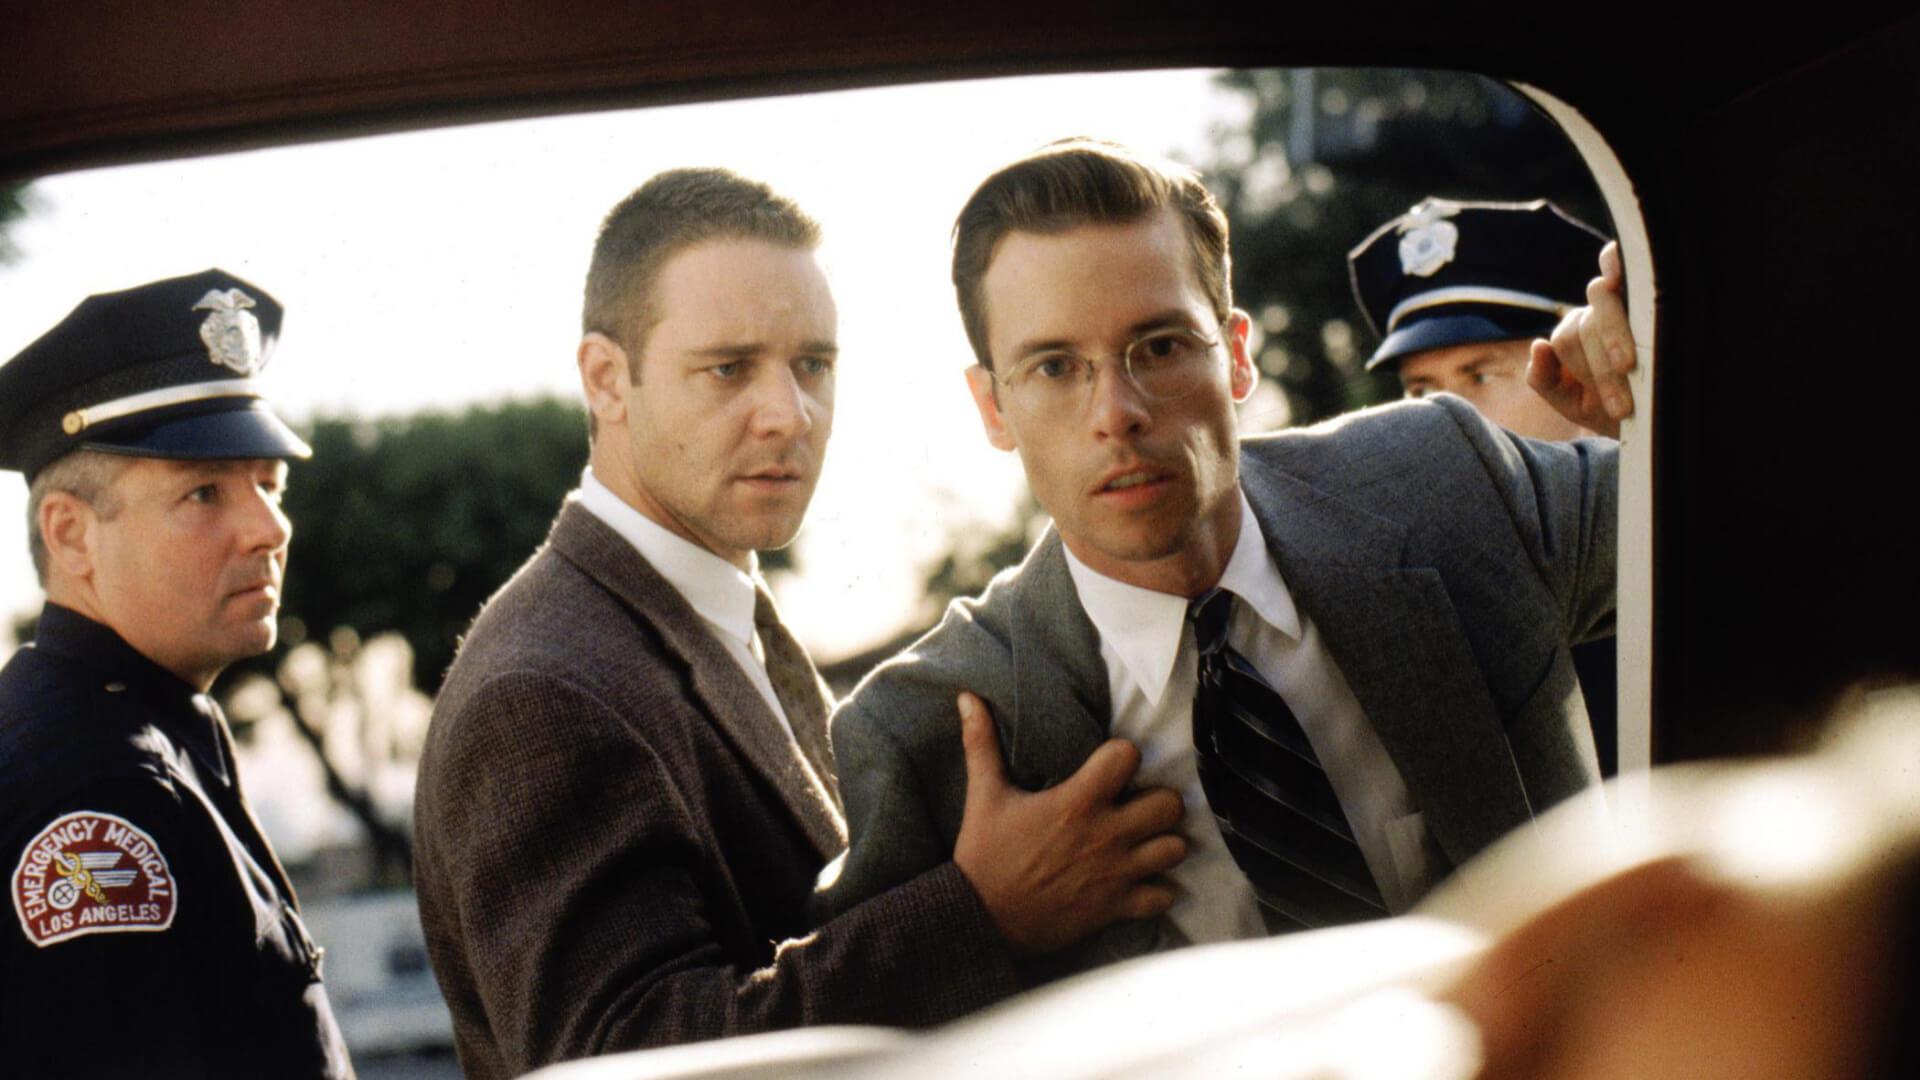 LA Confidential 1997 Christmas Movie